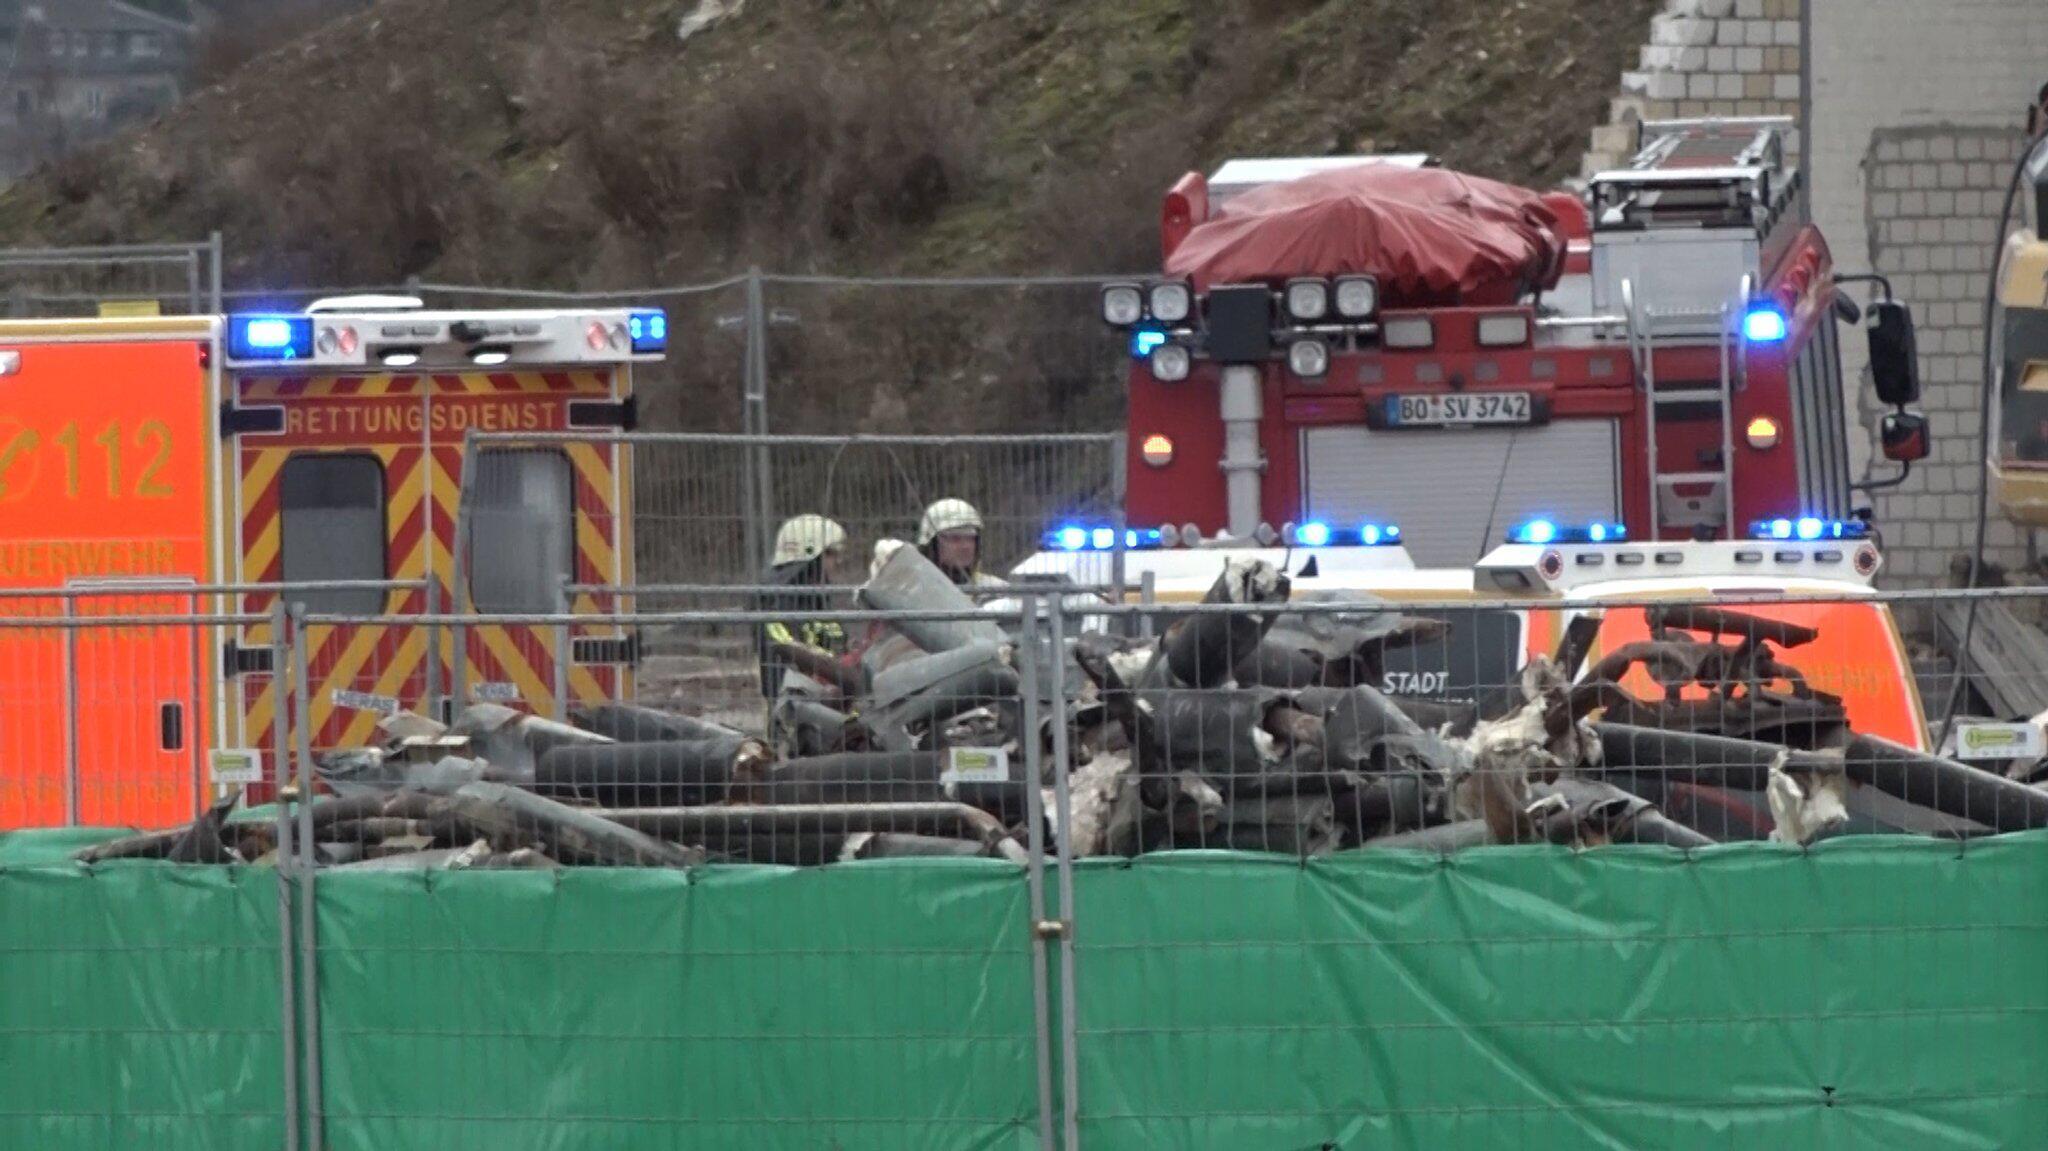 Bild zu Zwei Tote bei Arbeitsunfall in Bochum